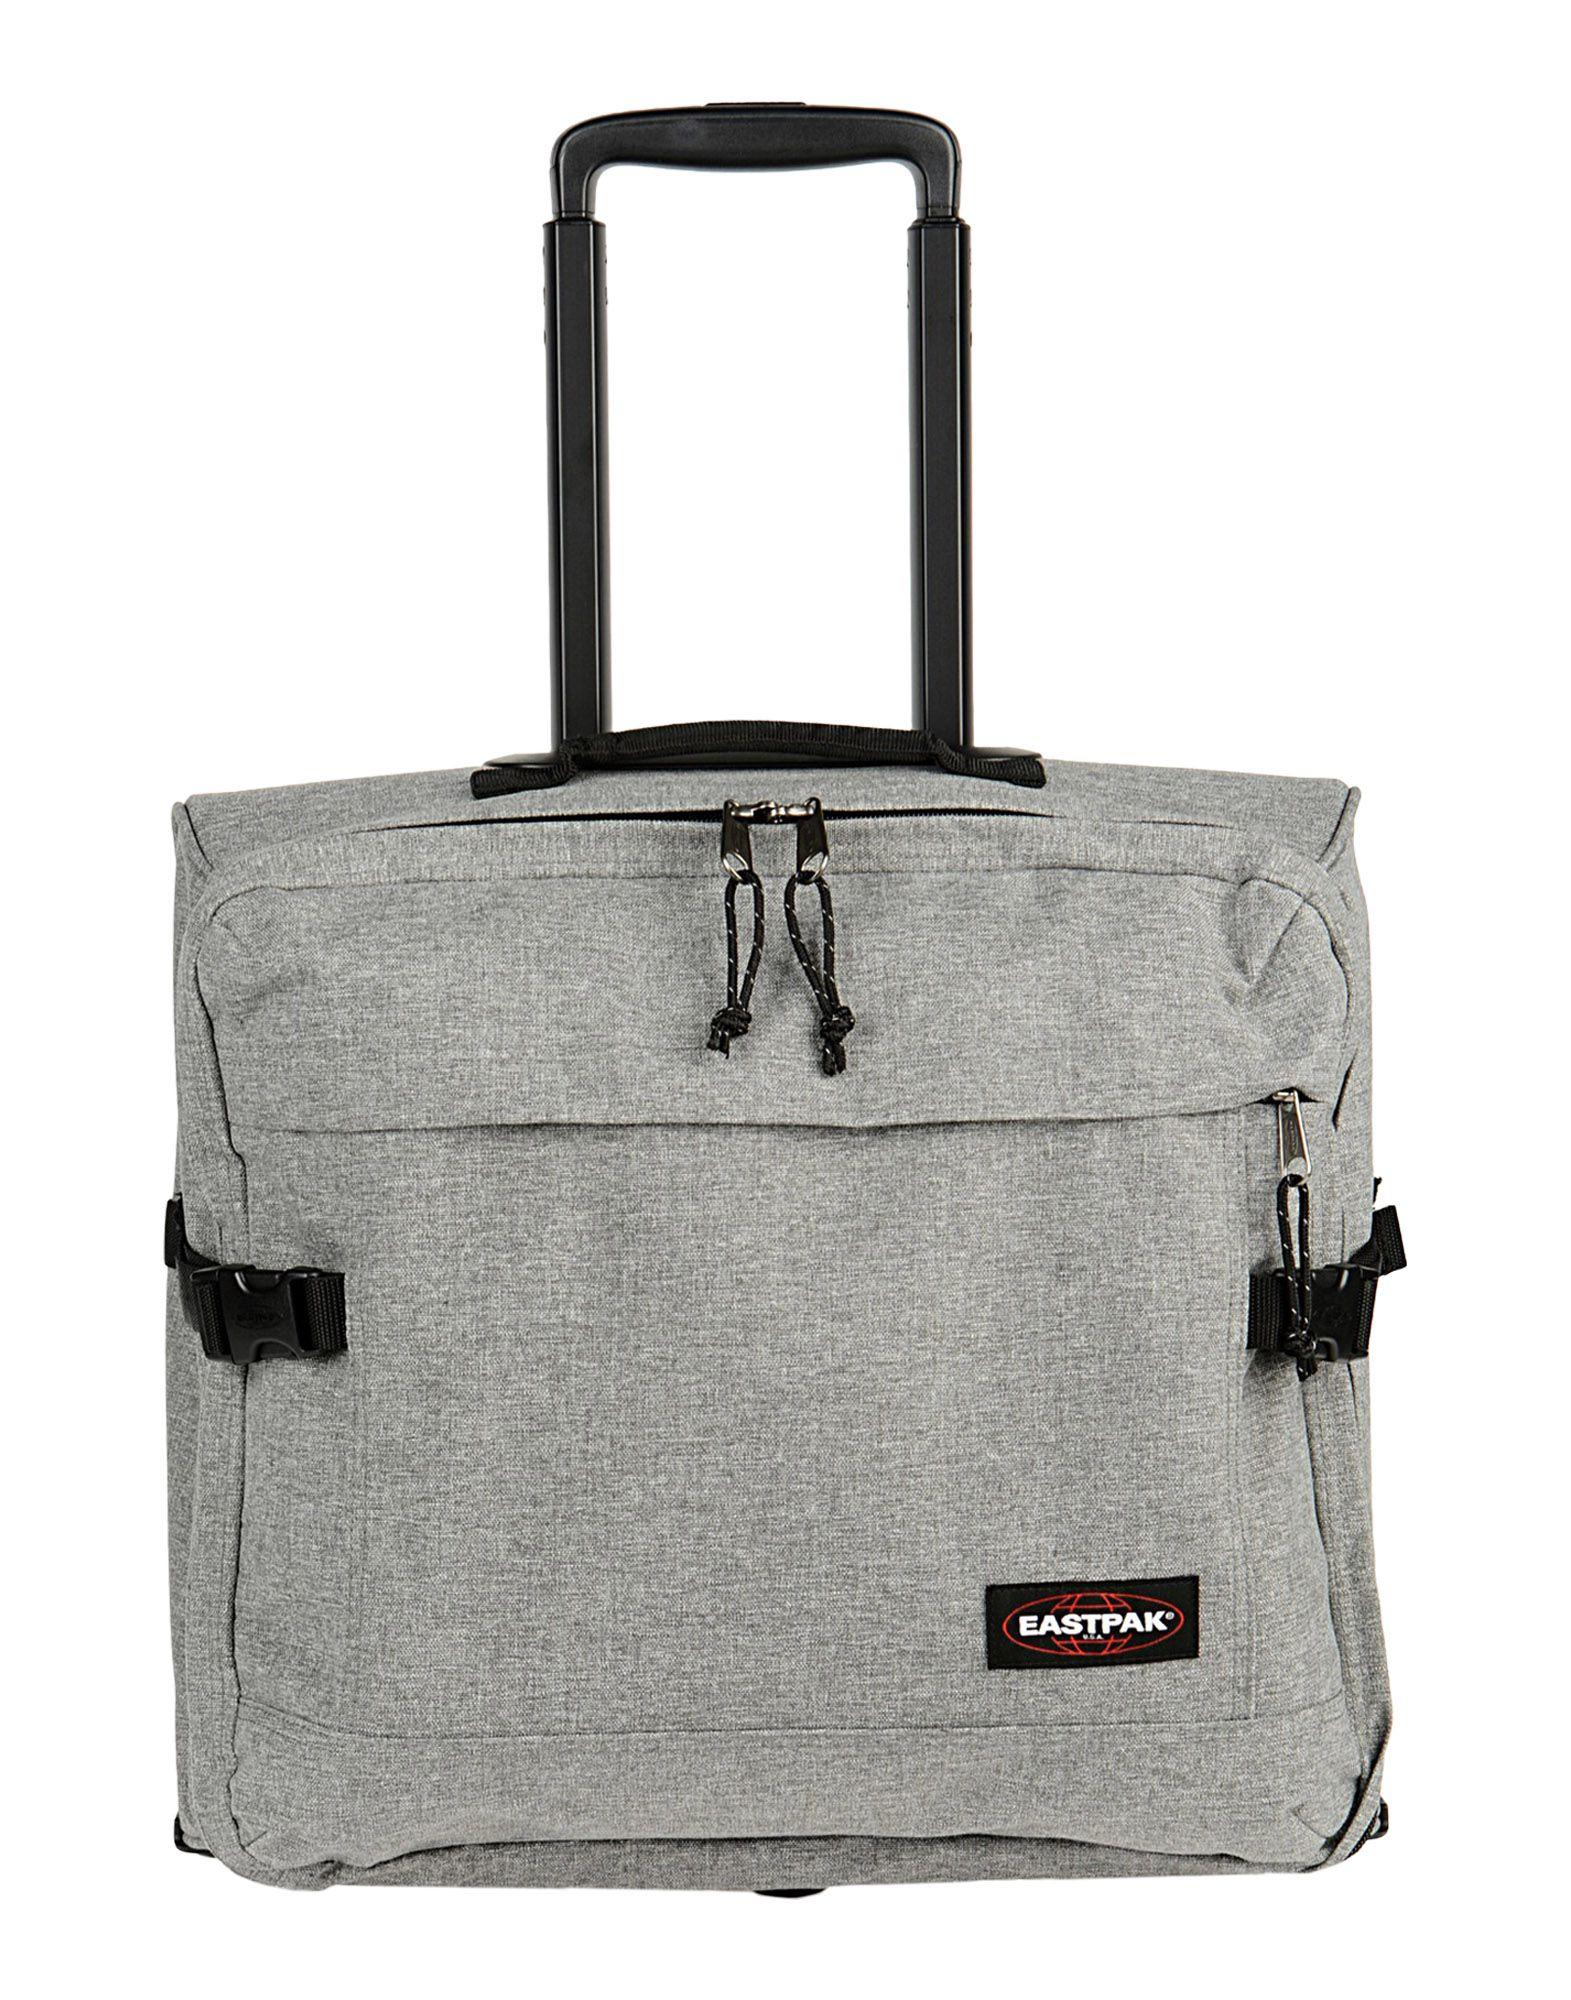 YOOX.COM(ユークス)《送料無料》EASTPAK Unisex キャスター付きバッグ グレー 紡績繊維